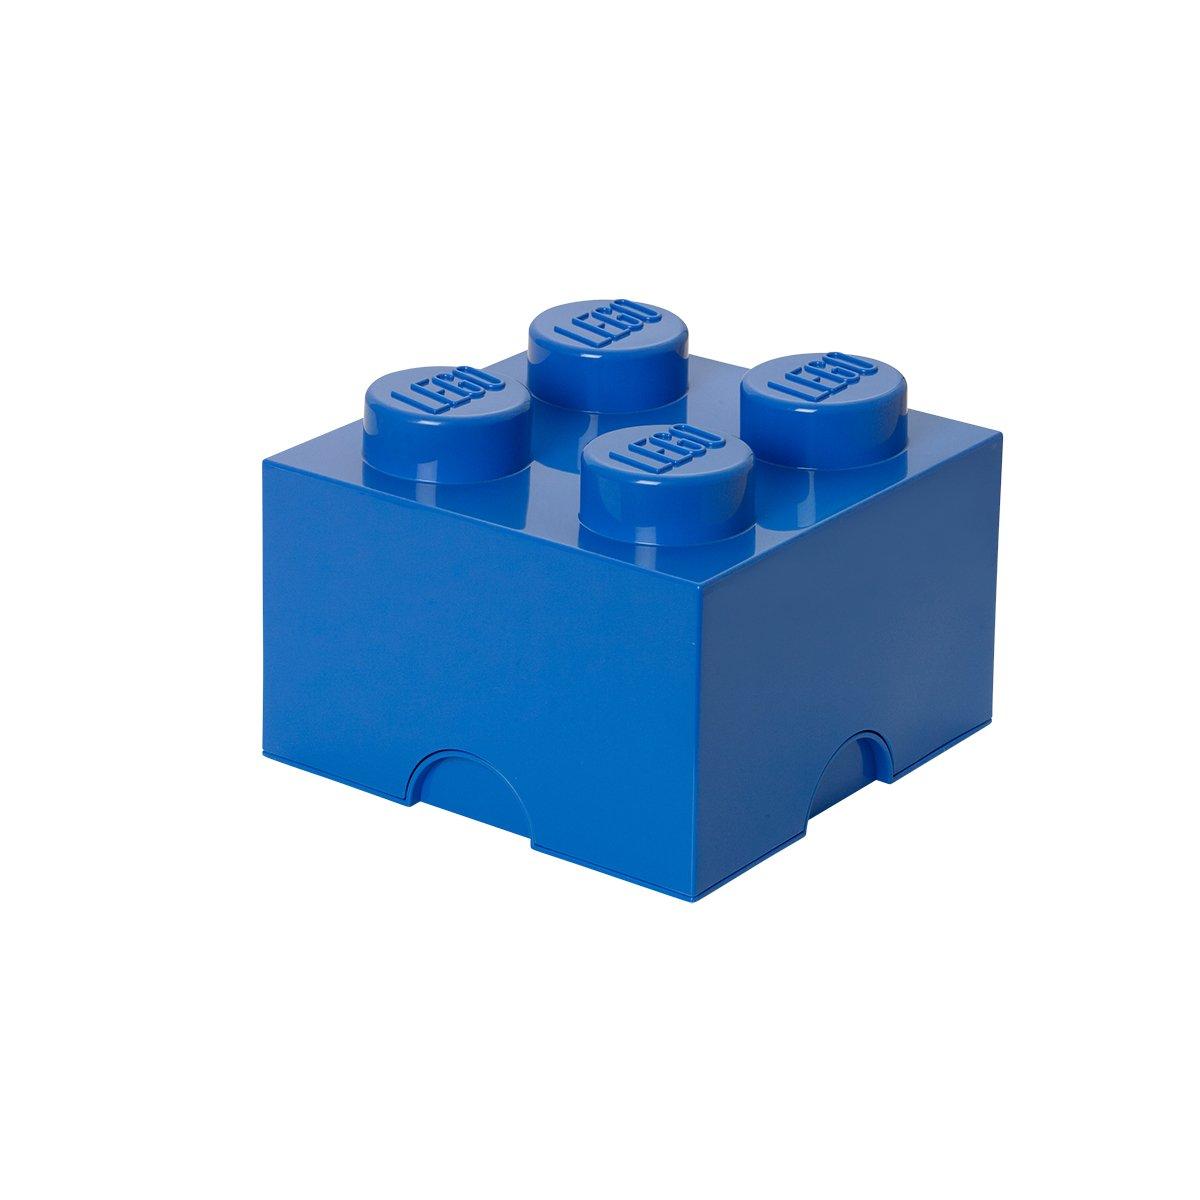 LEGO Storage Box Brick 4 Bright Blue, 4 Knobs